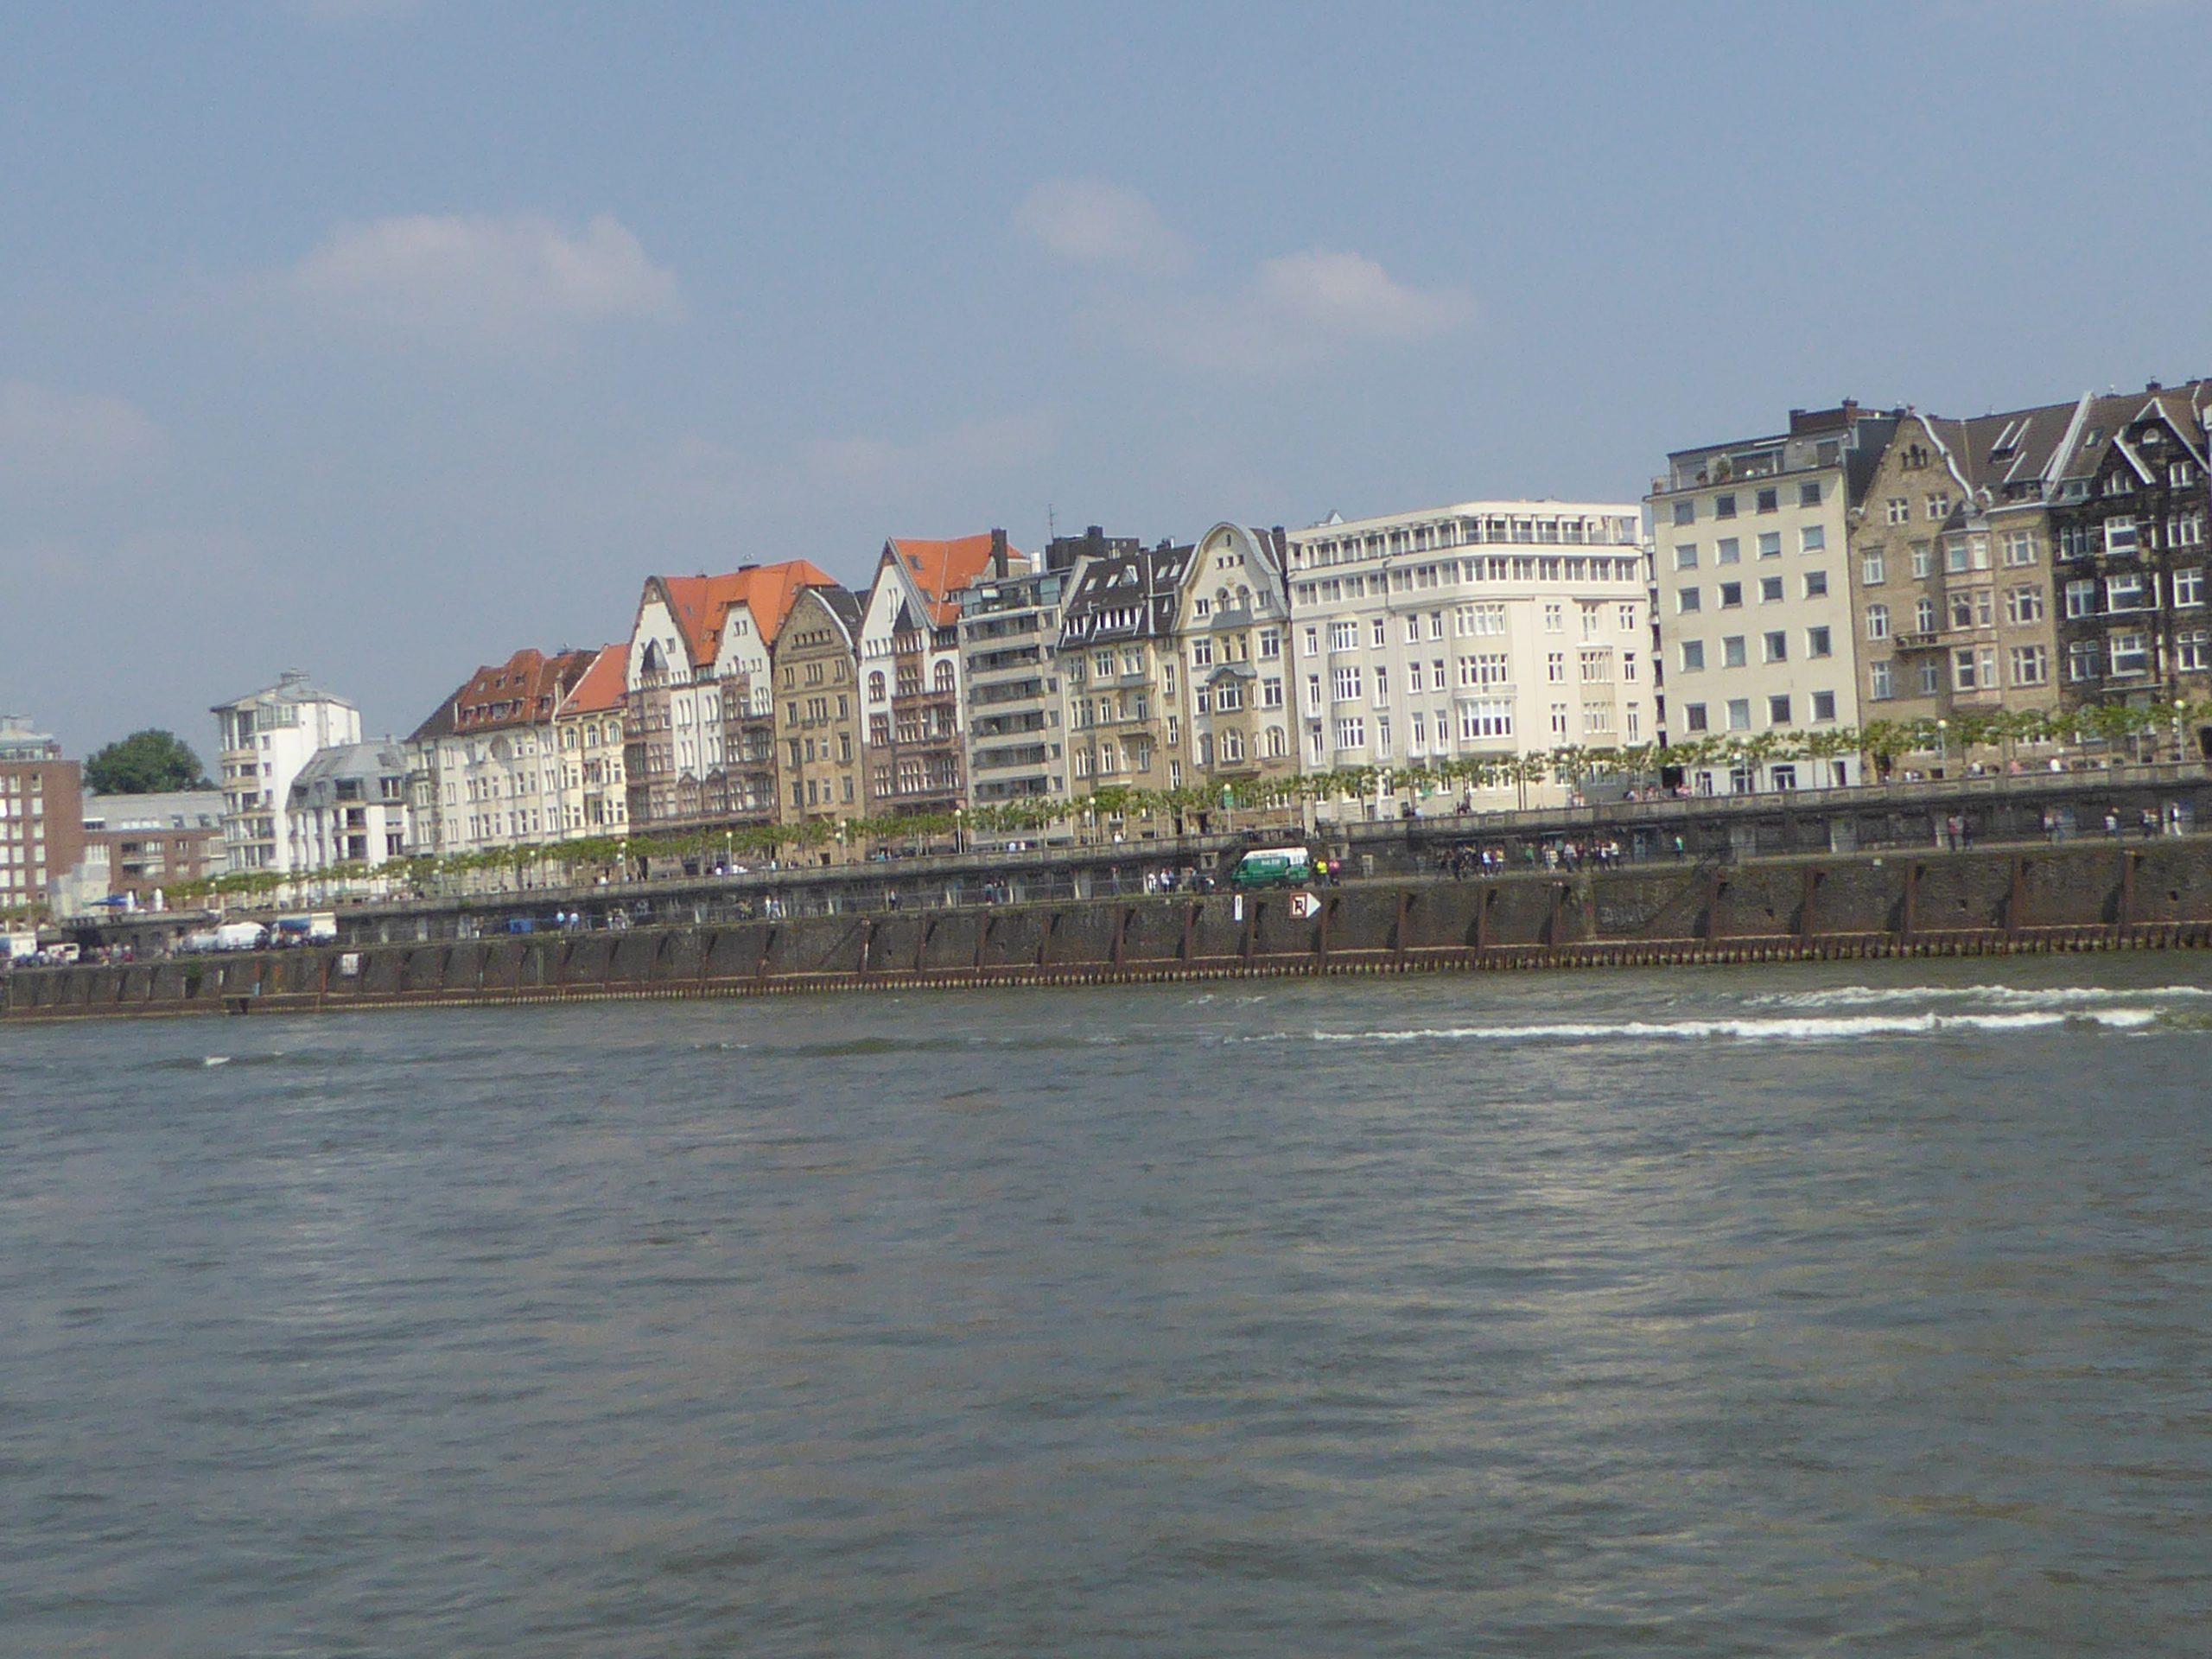 Altstadthäuser